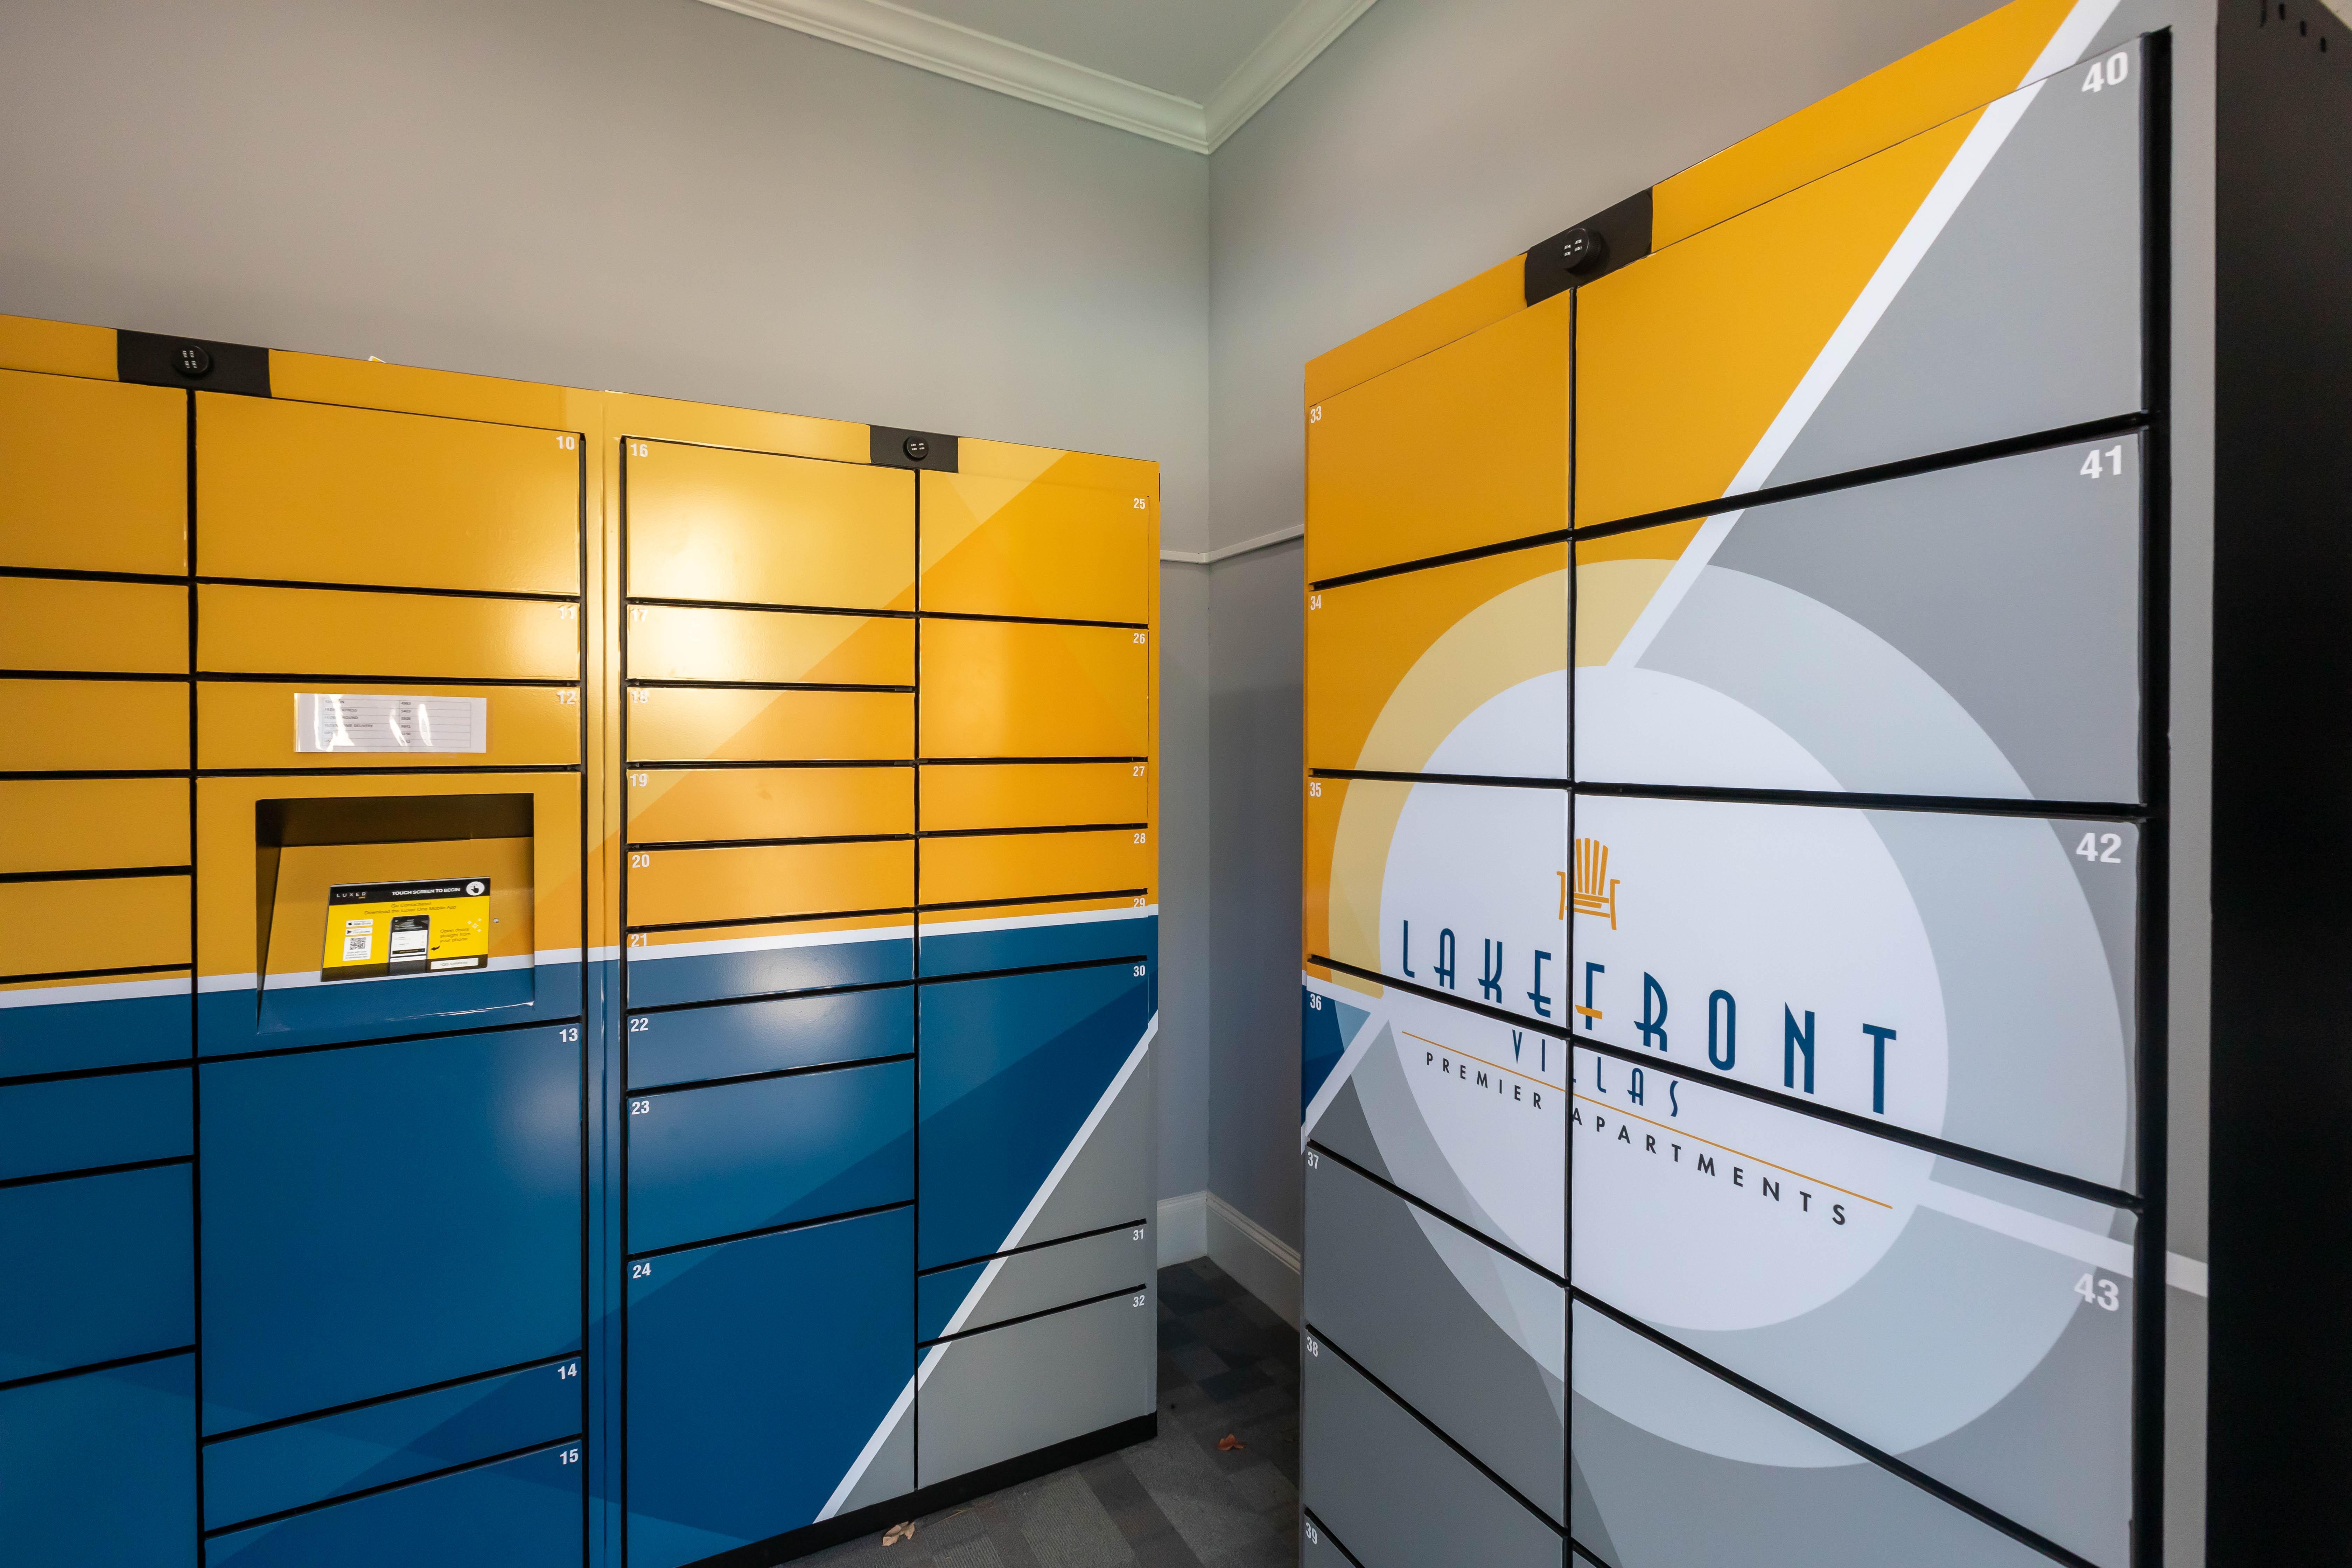 Resident package lockers at Lakefront Villas